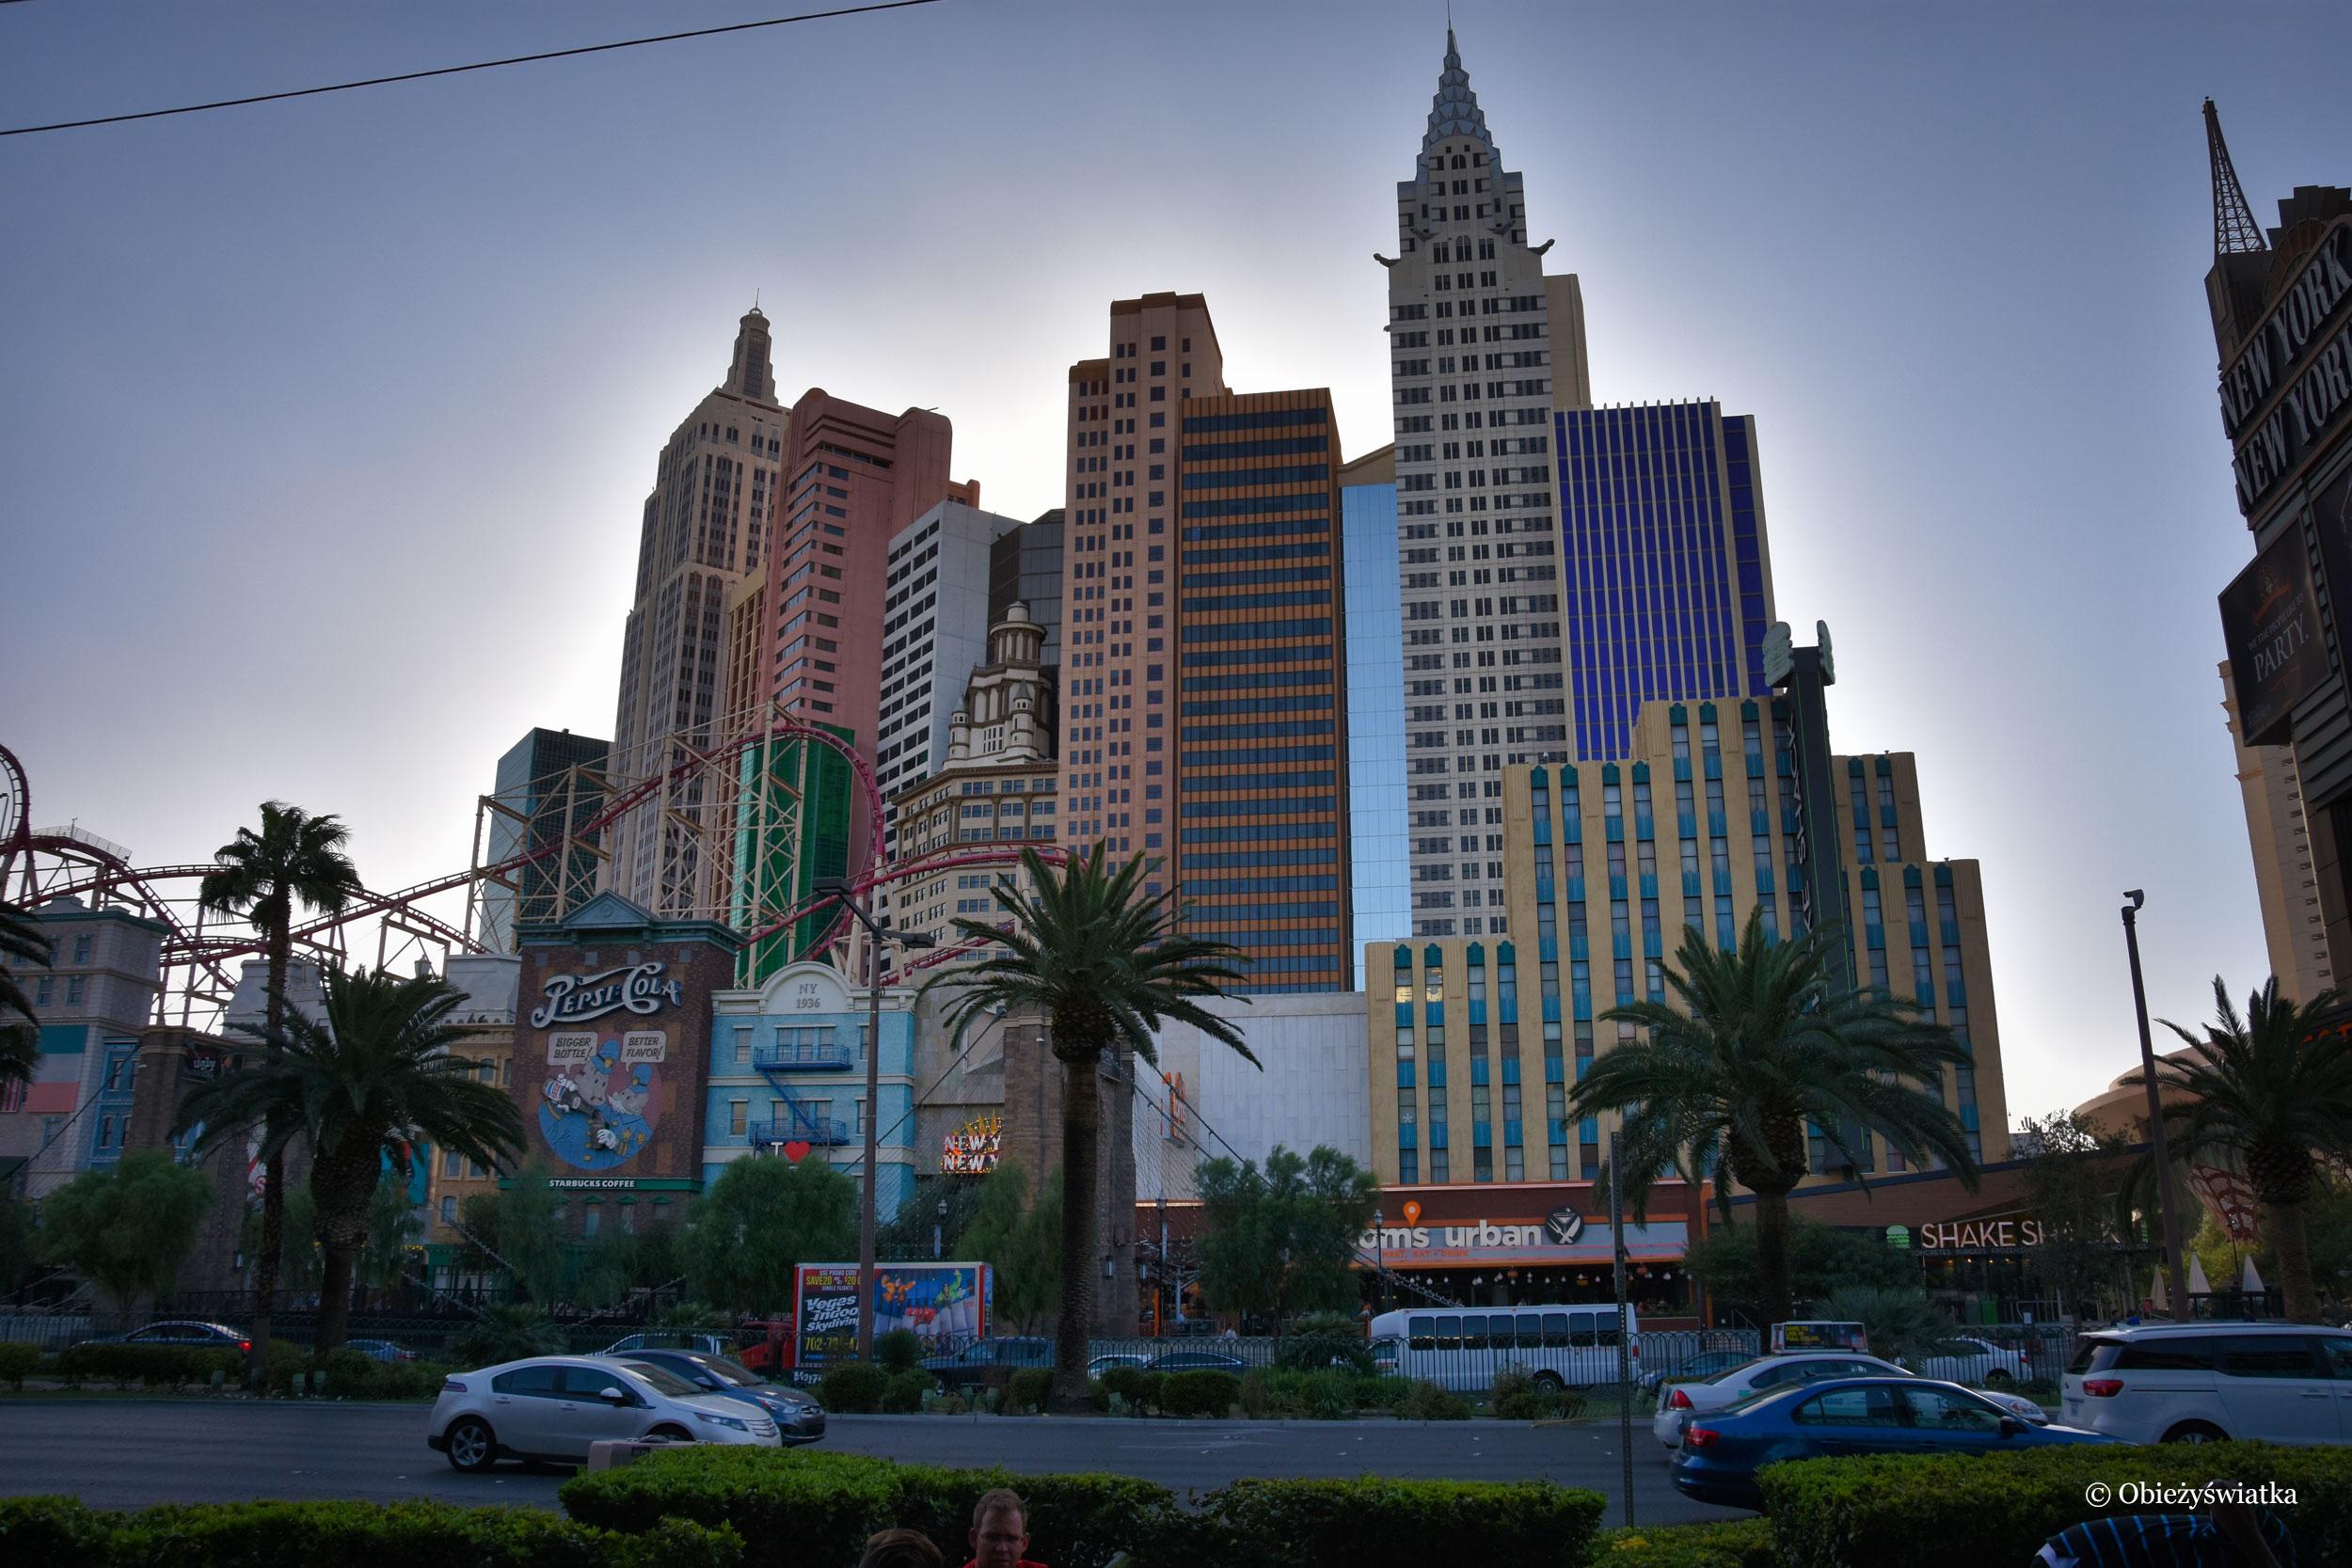 Hotel New York, New York w Las Vegas, Nevada